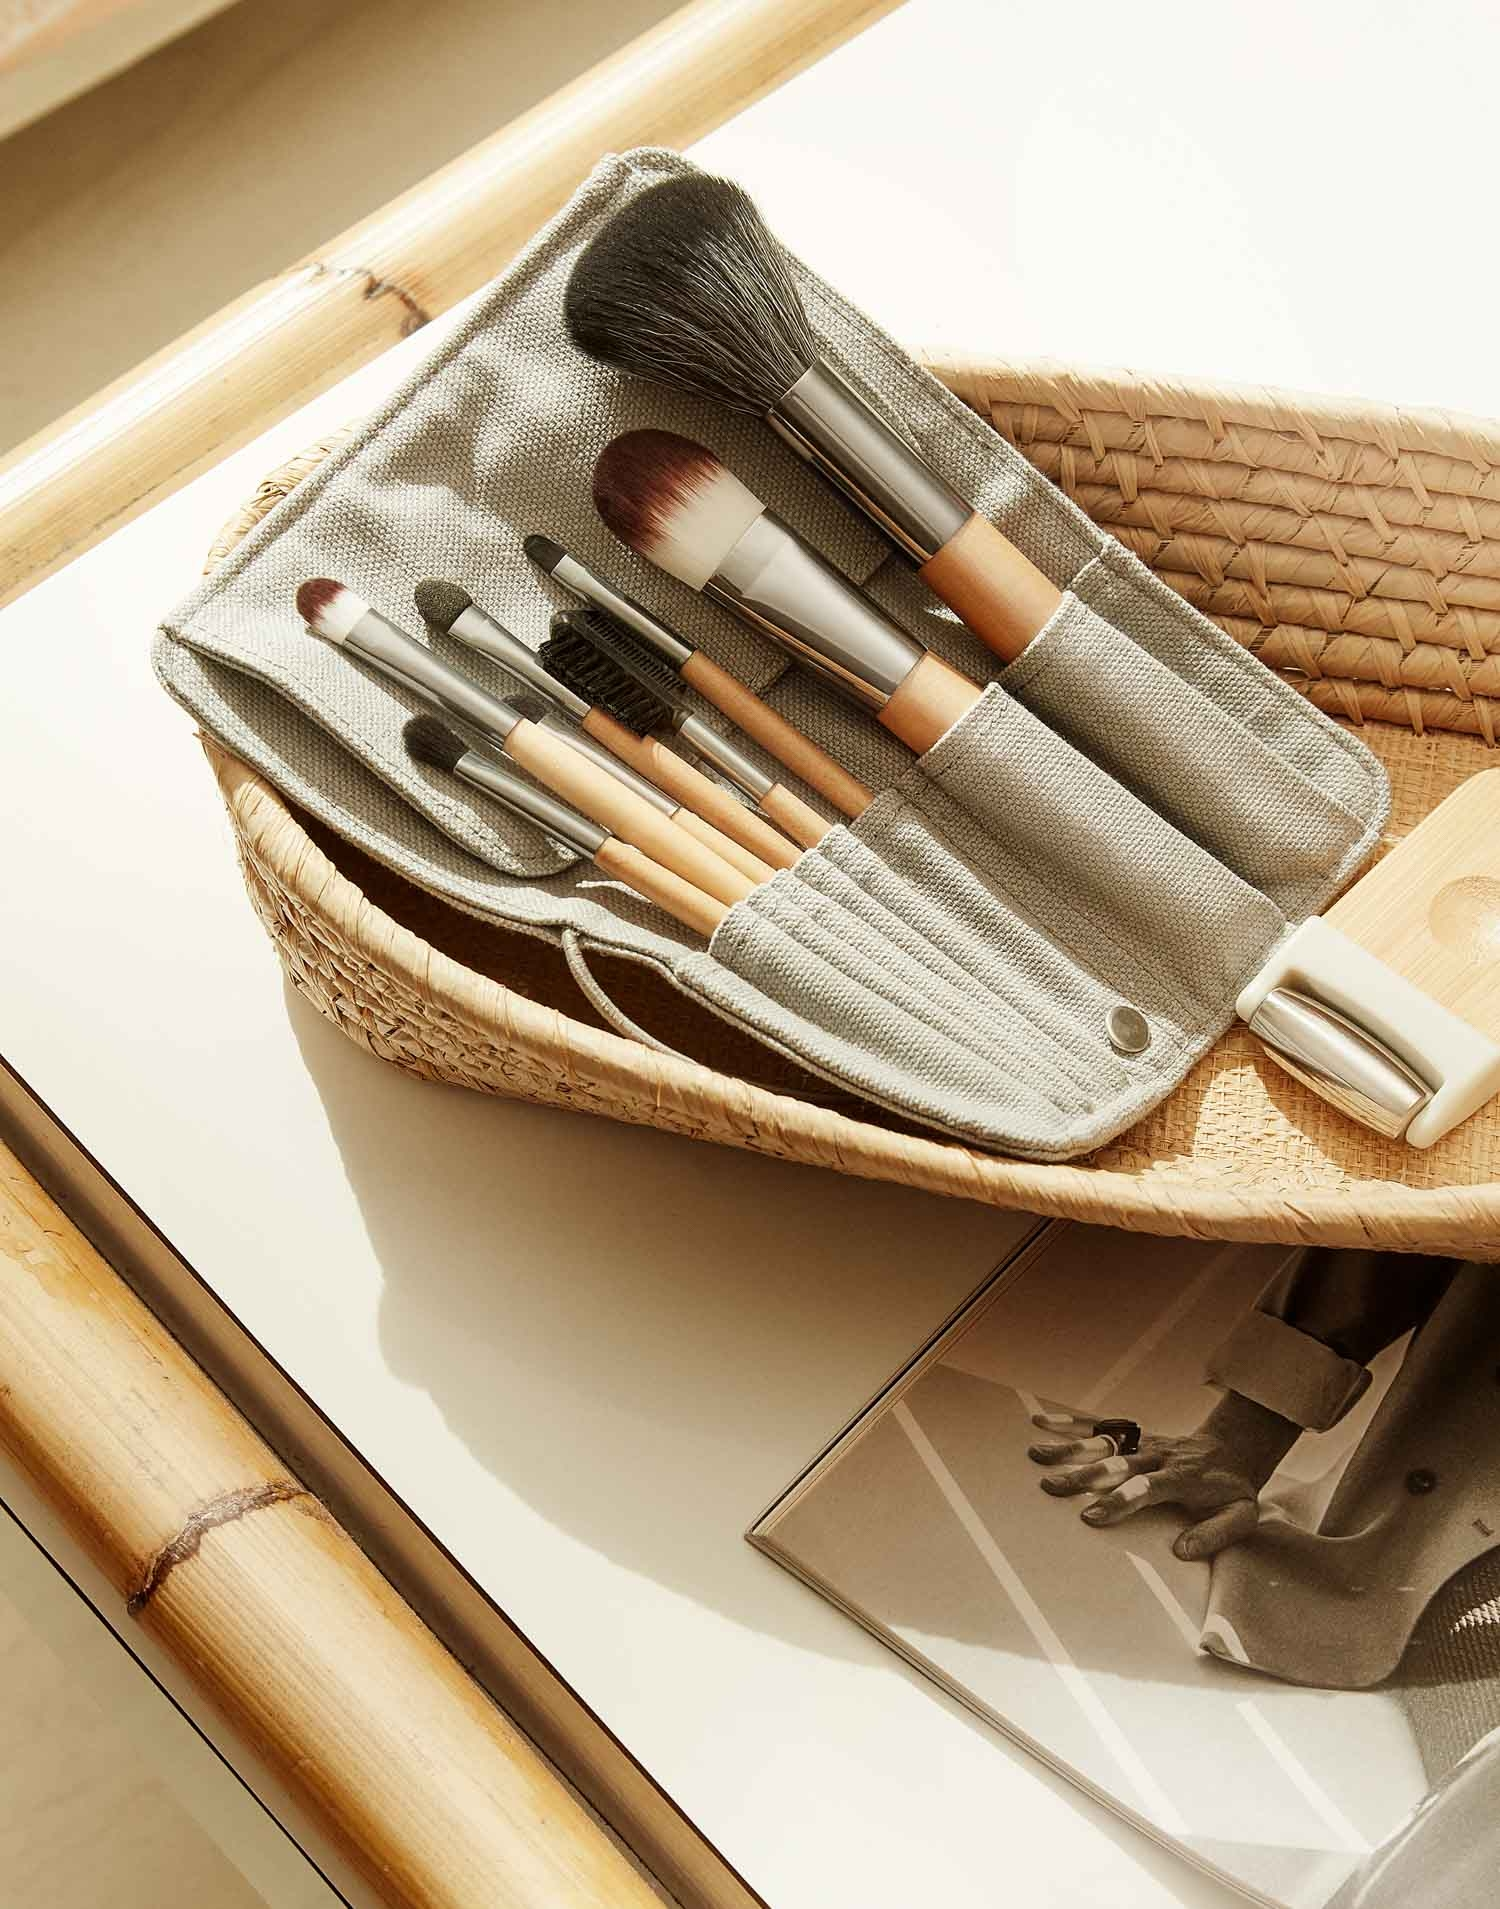 Set of 8 makeup brushes